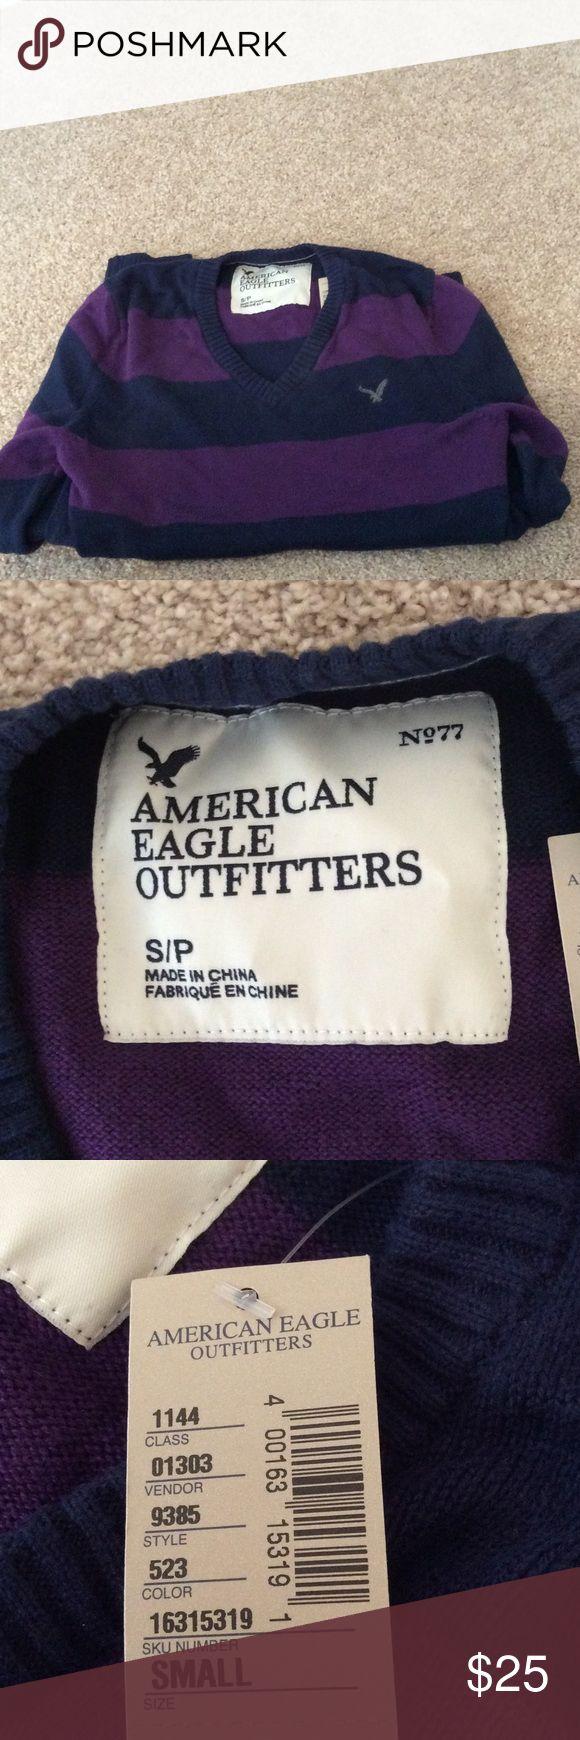 NWT AMERICAN EAGLE MENS V NECK SWEATER NWT American Eagle mens v neck long sleeve sweater size small in dark blue and dark purple stripes. Sweater is 100% cotton. American Eagle Outfitters Sweaters V-Neck